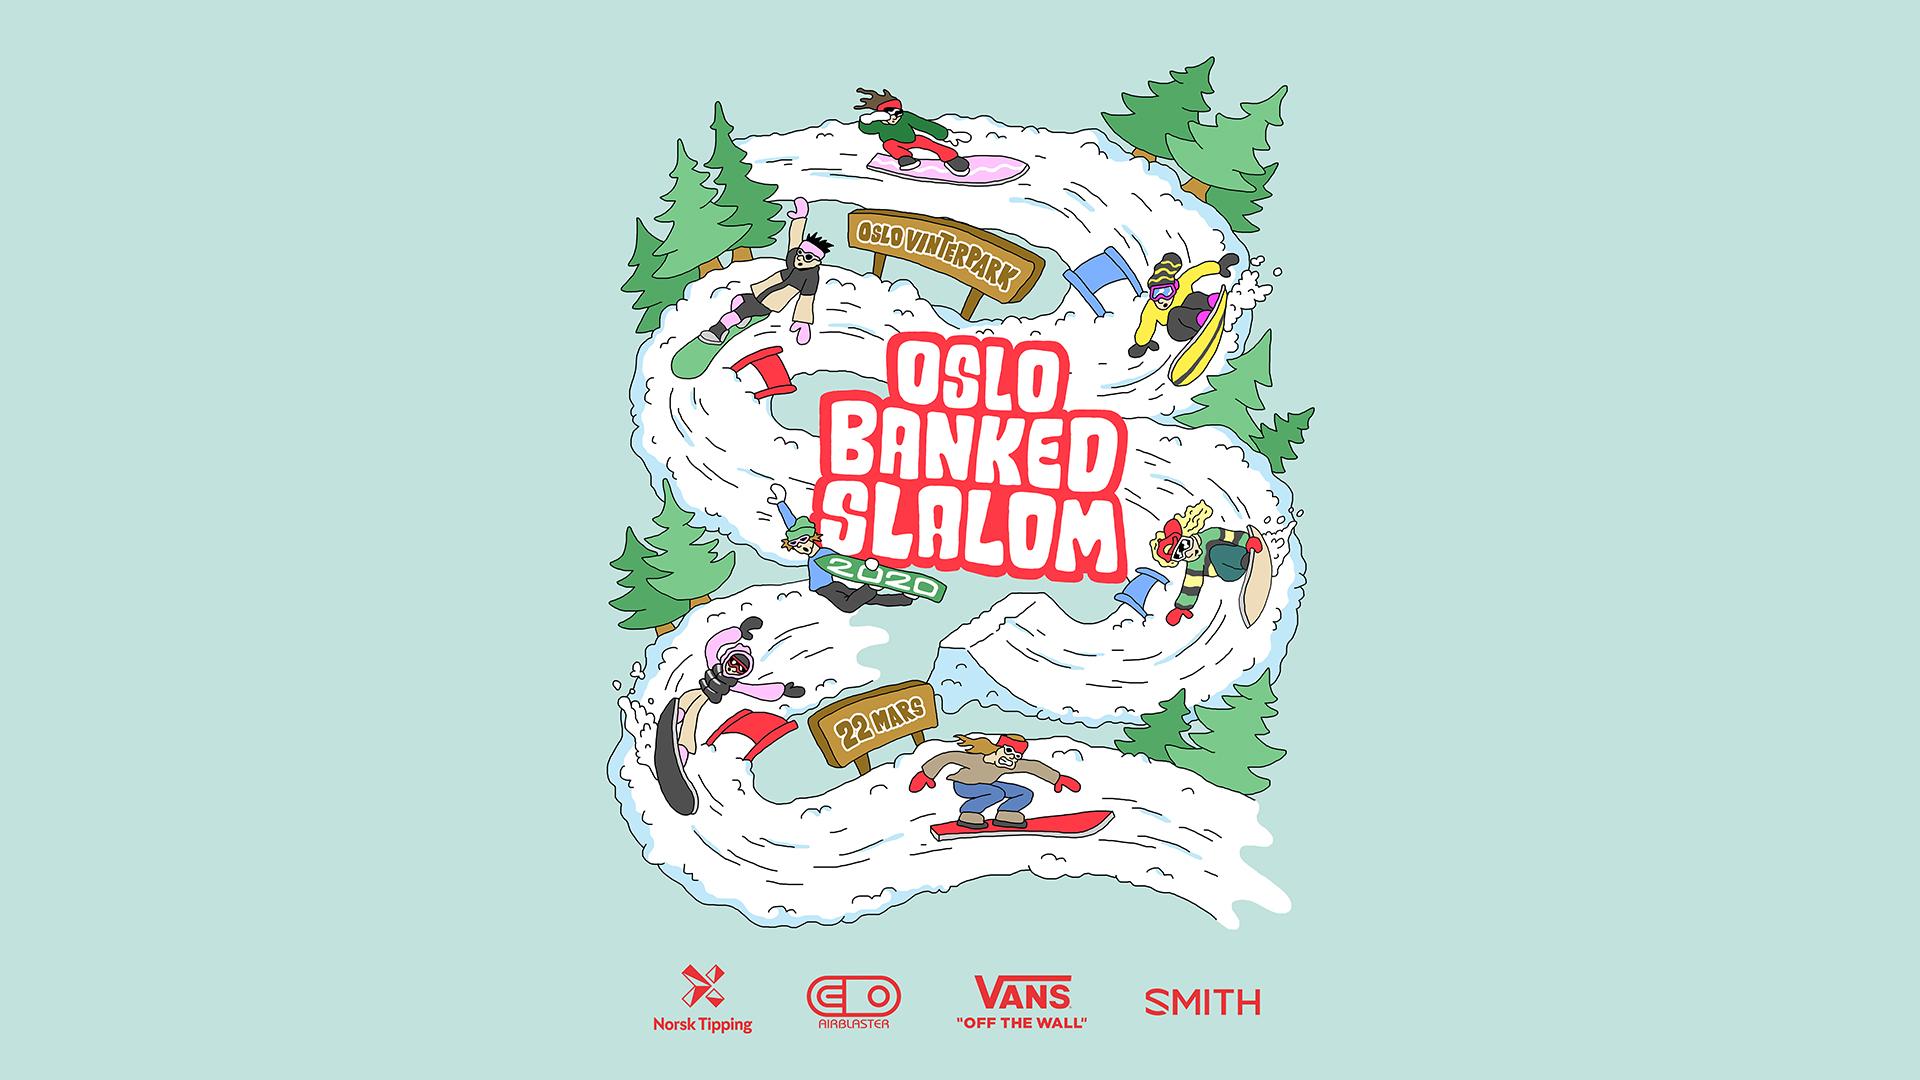 Oslo Banked Slalom